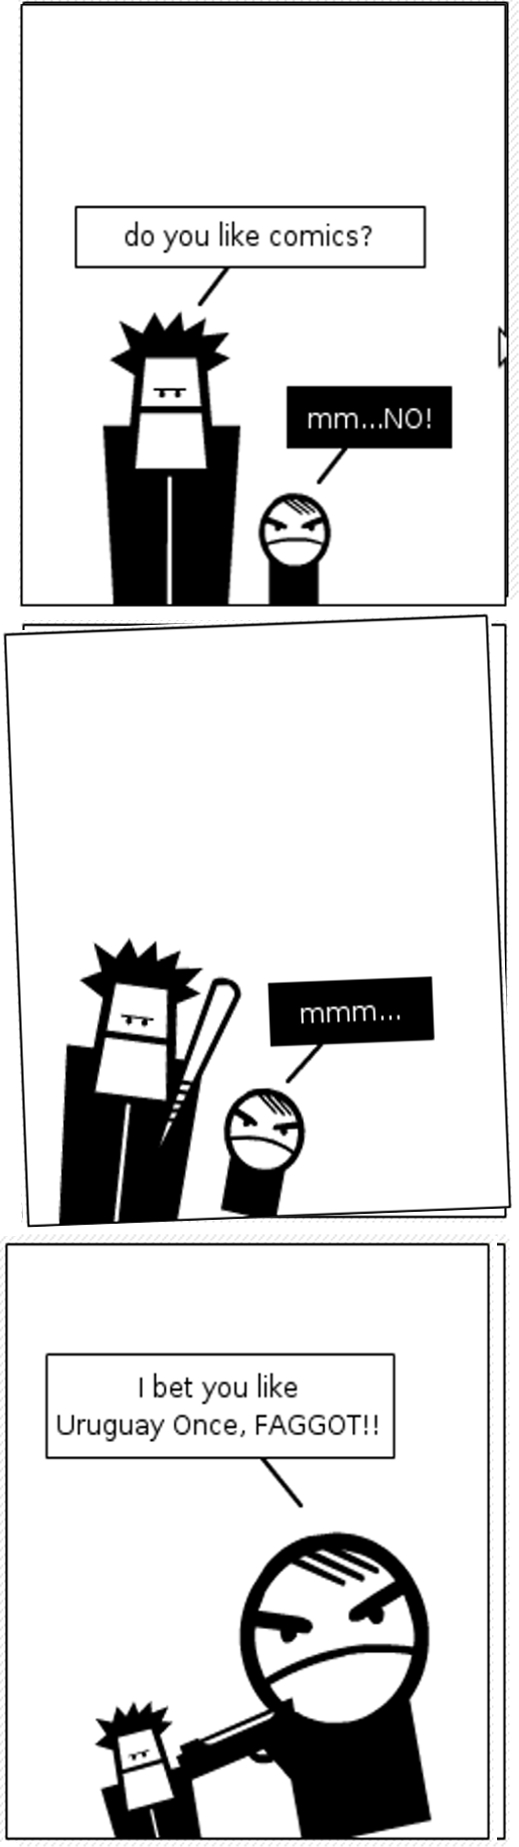 comic1sb.jpg